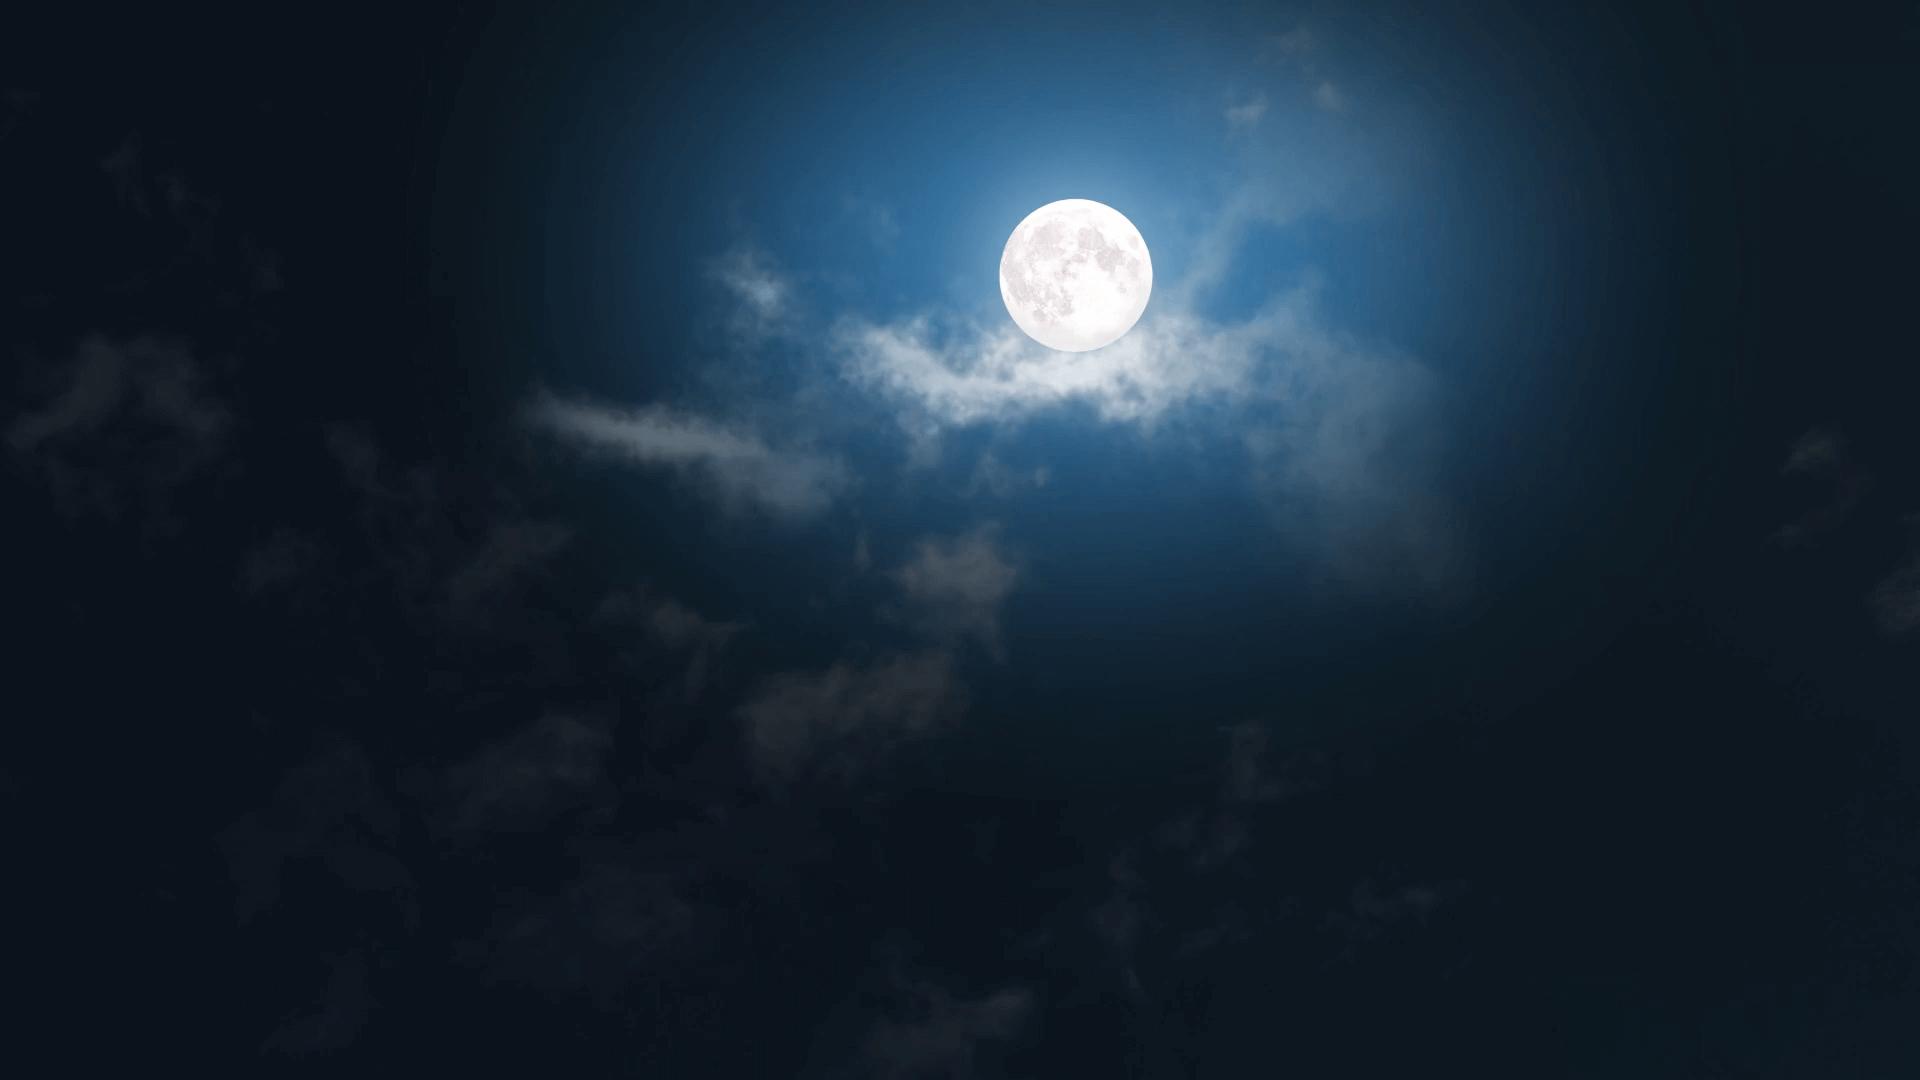 Coaching in the dark online